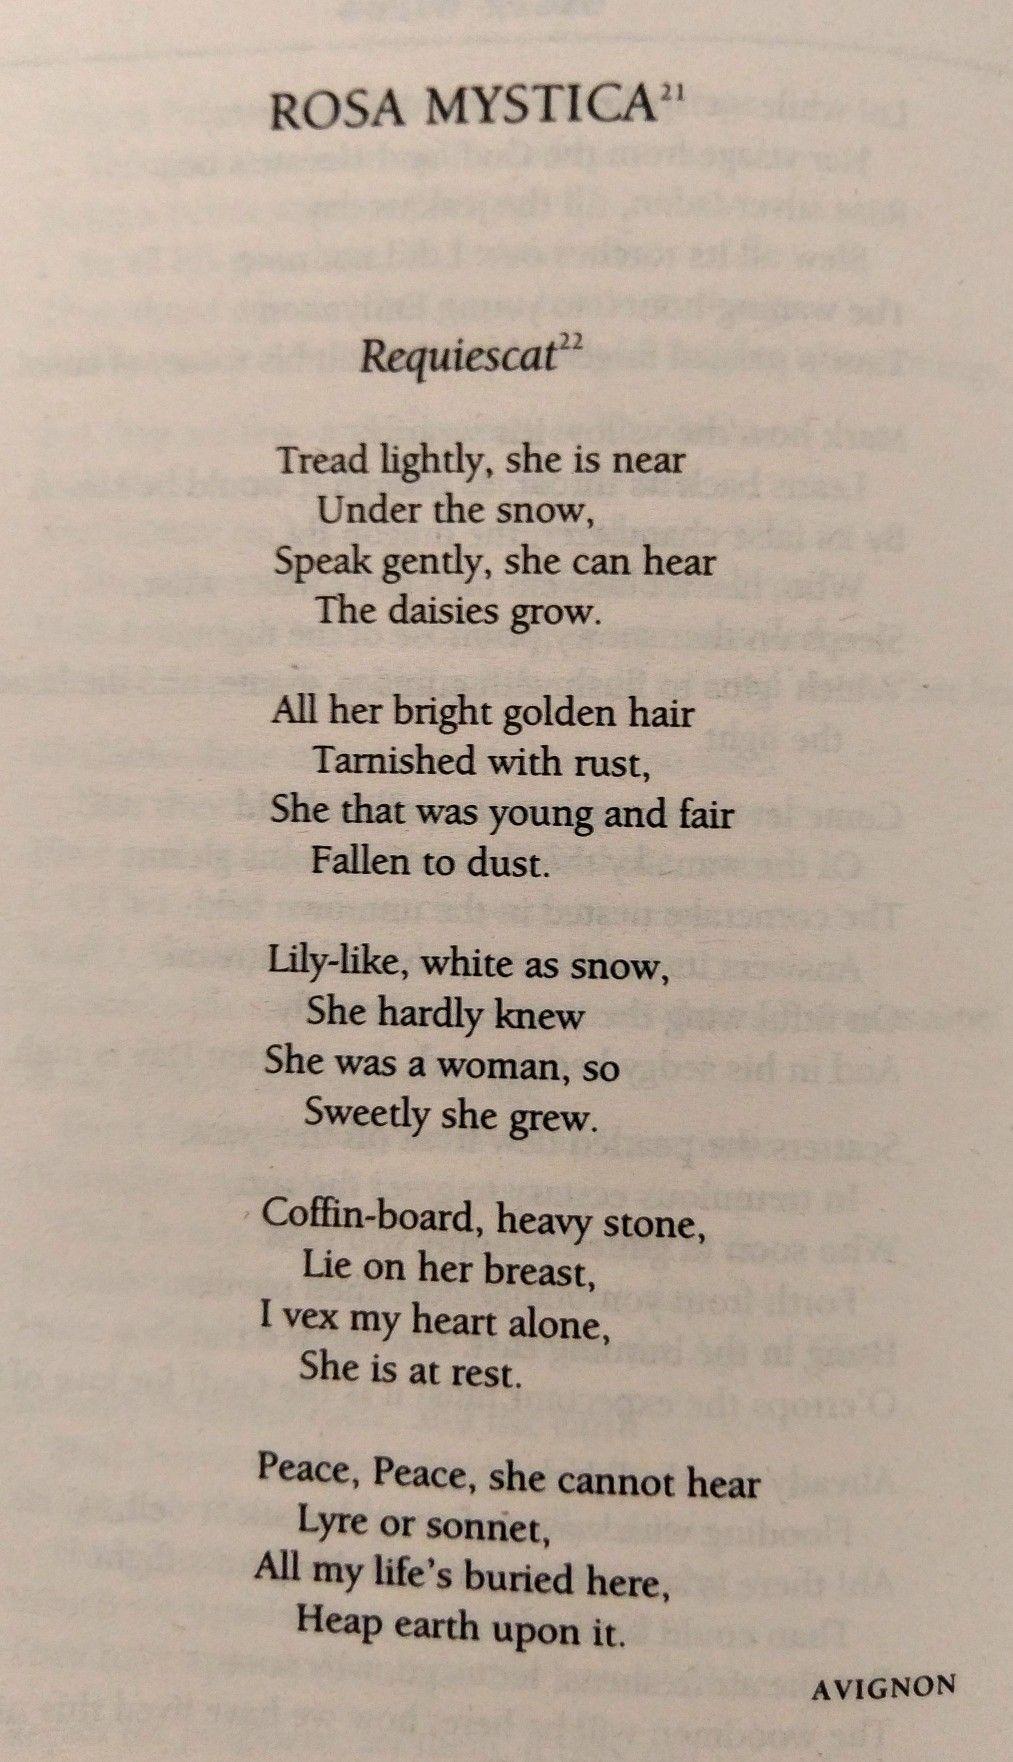 Oscar Wilde Rosa Mystica Requiescat Poems Oscar Wilde Words